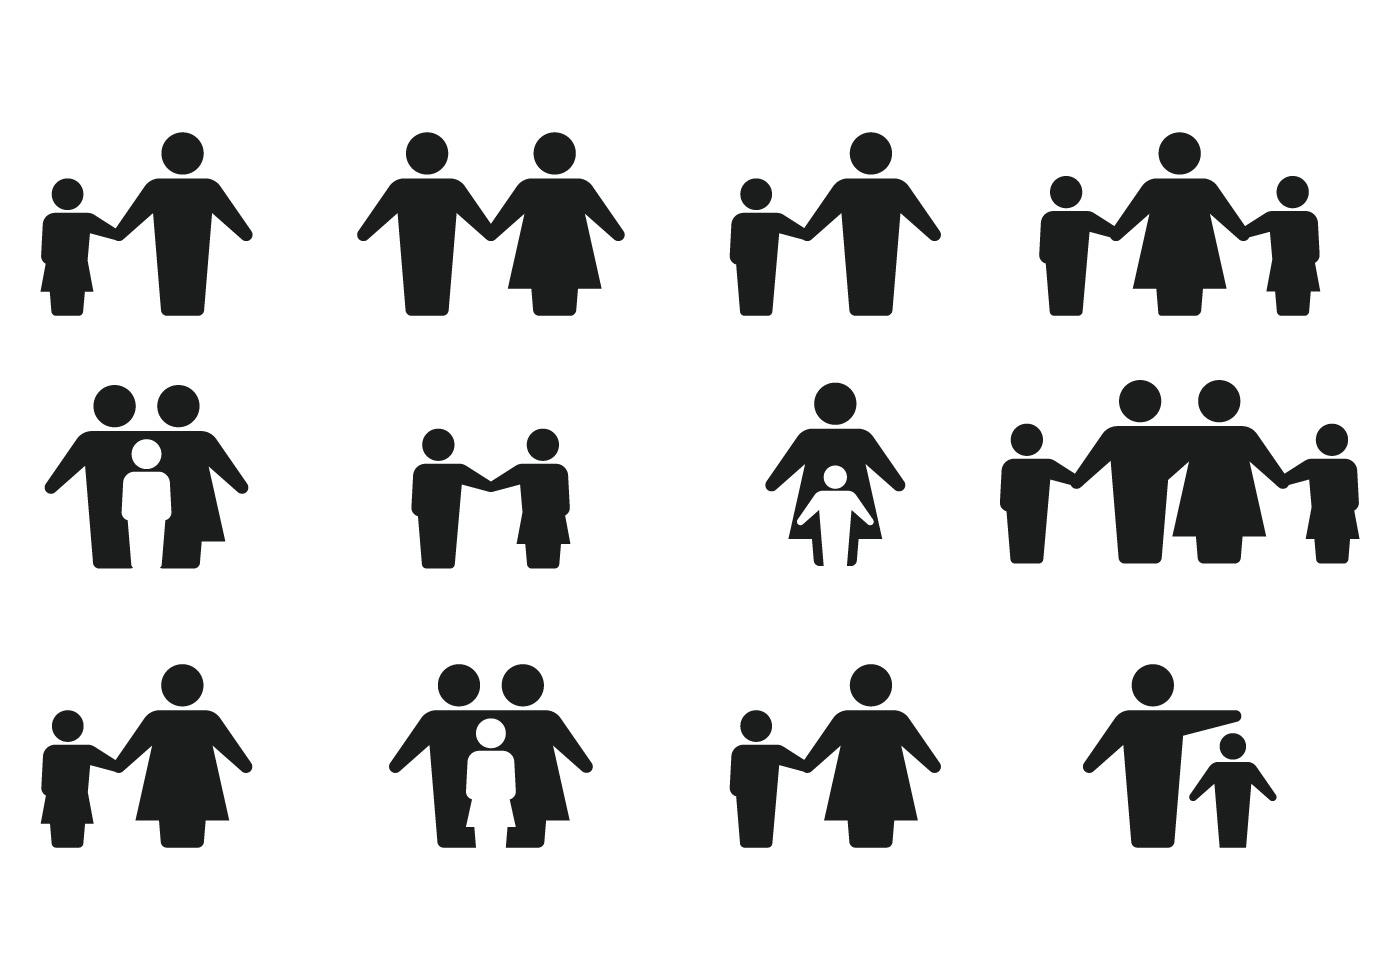 Simple De La Silueta Icono De La Familia Vectores